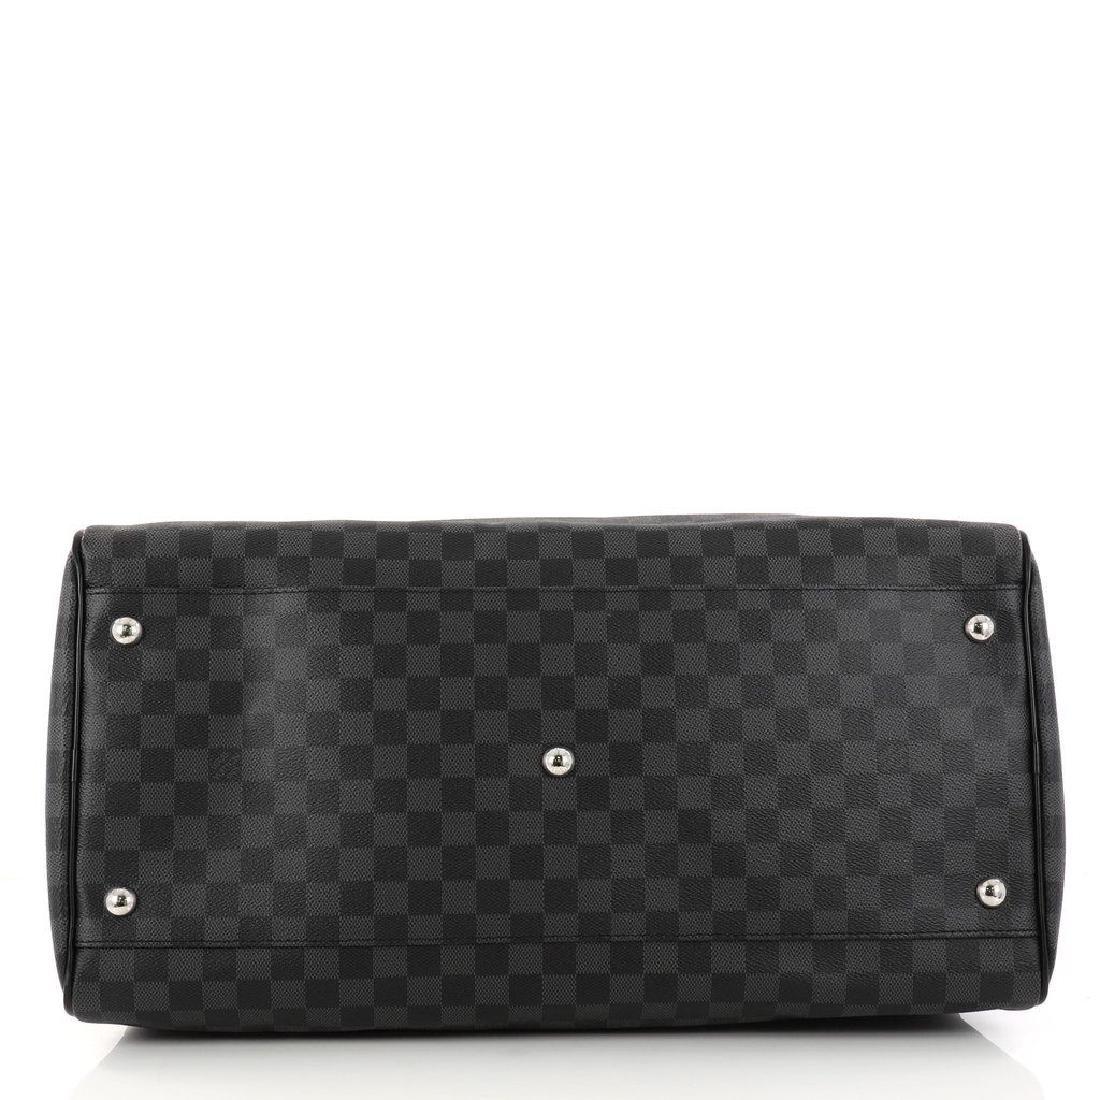 Louis Vuitton Neo Kendall Damier Graphite Duffle - 8